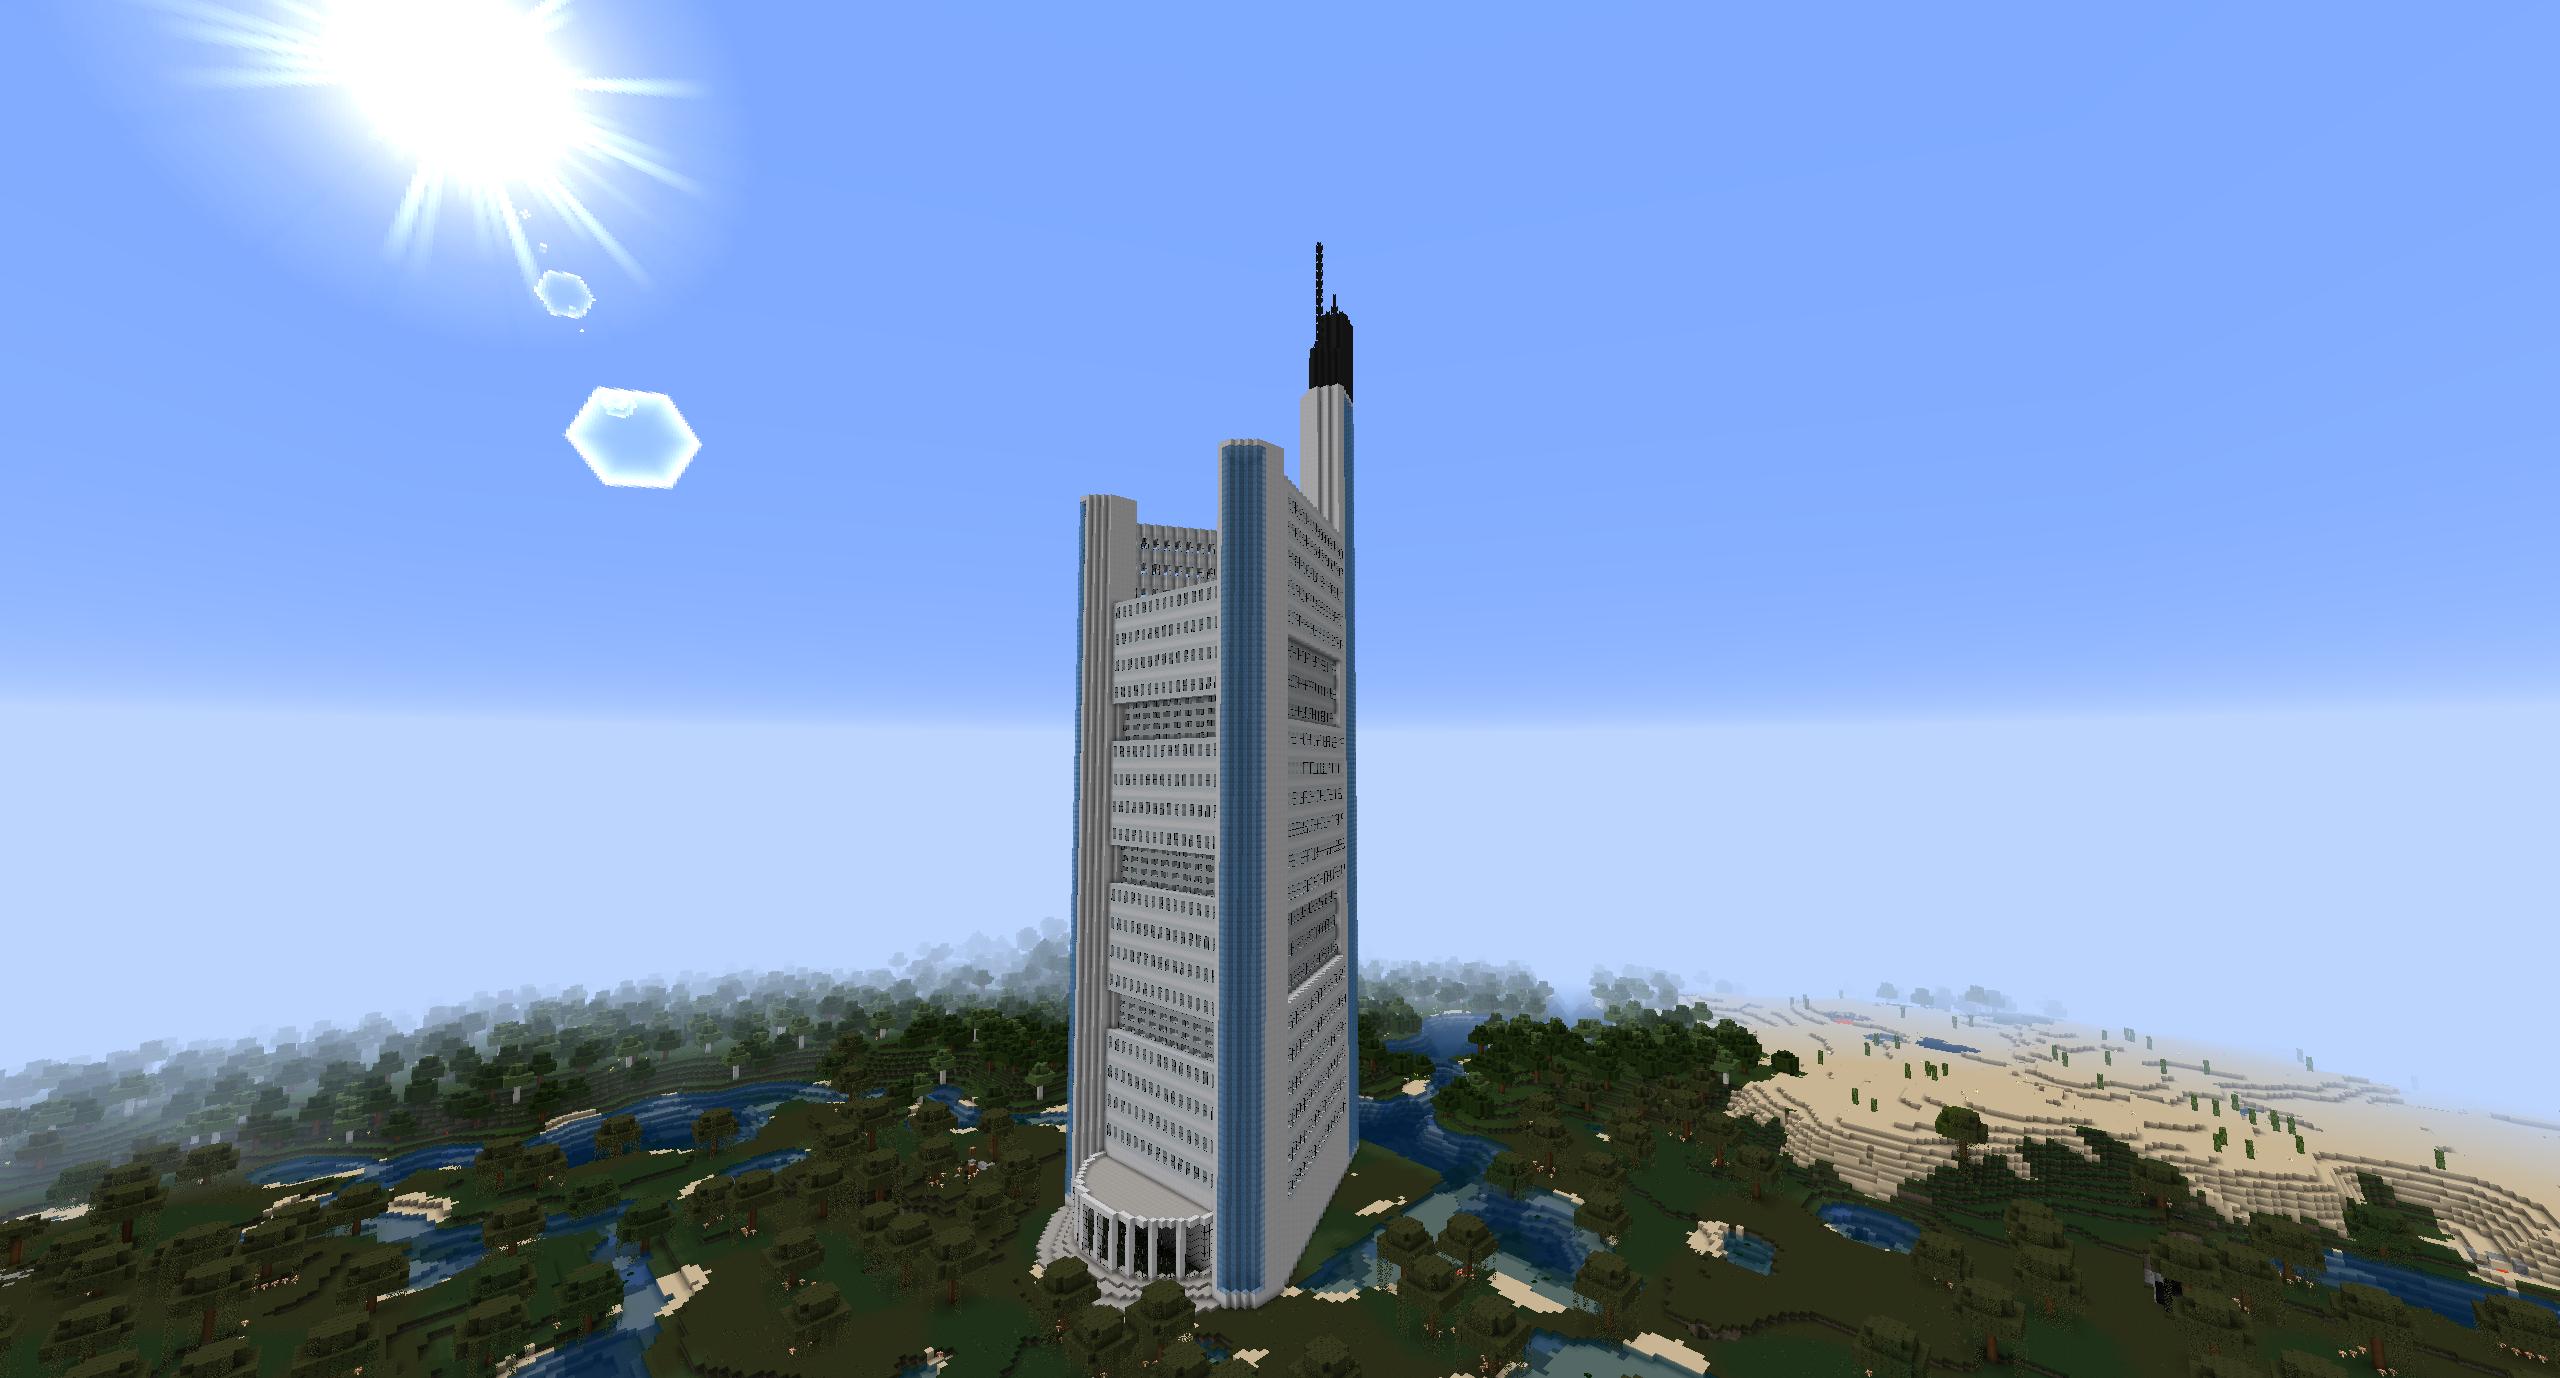 Minecraft Commerzbank Tower By Minecraftarchitect90 On